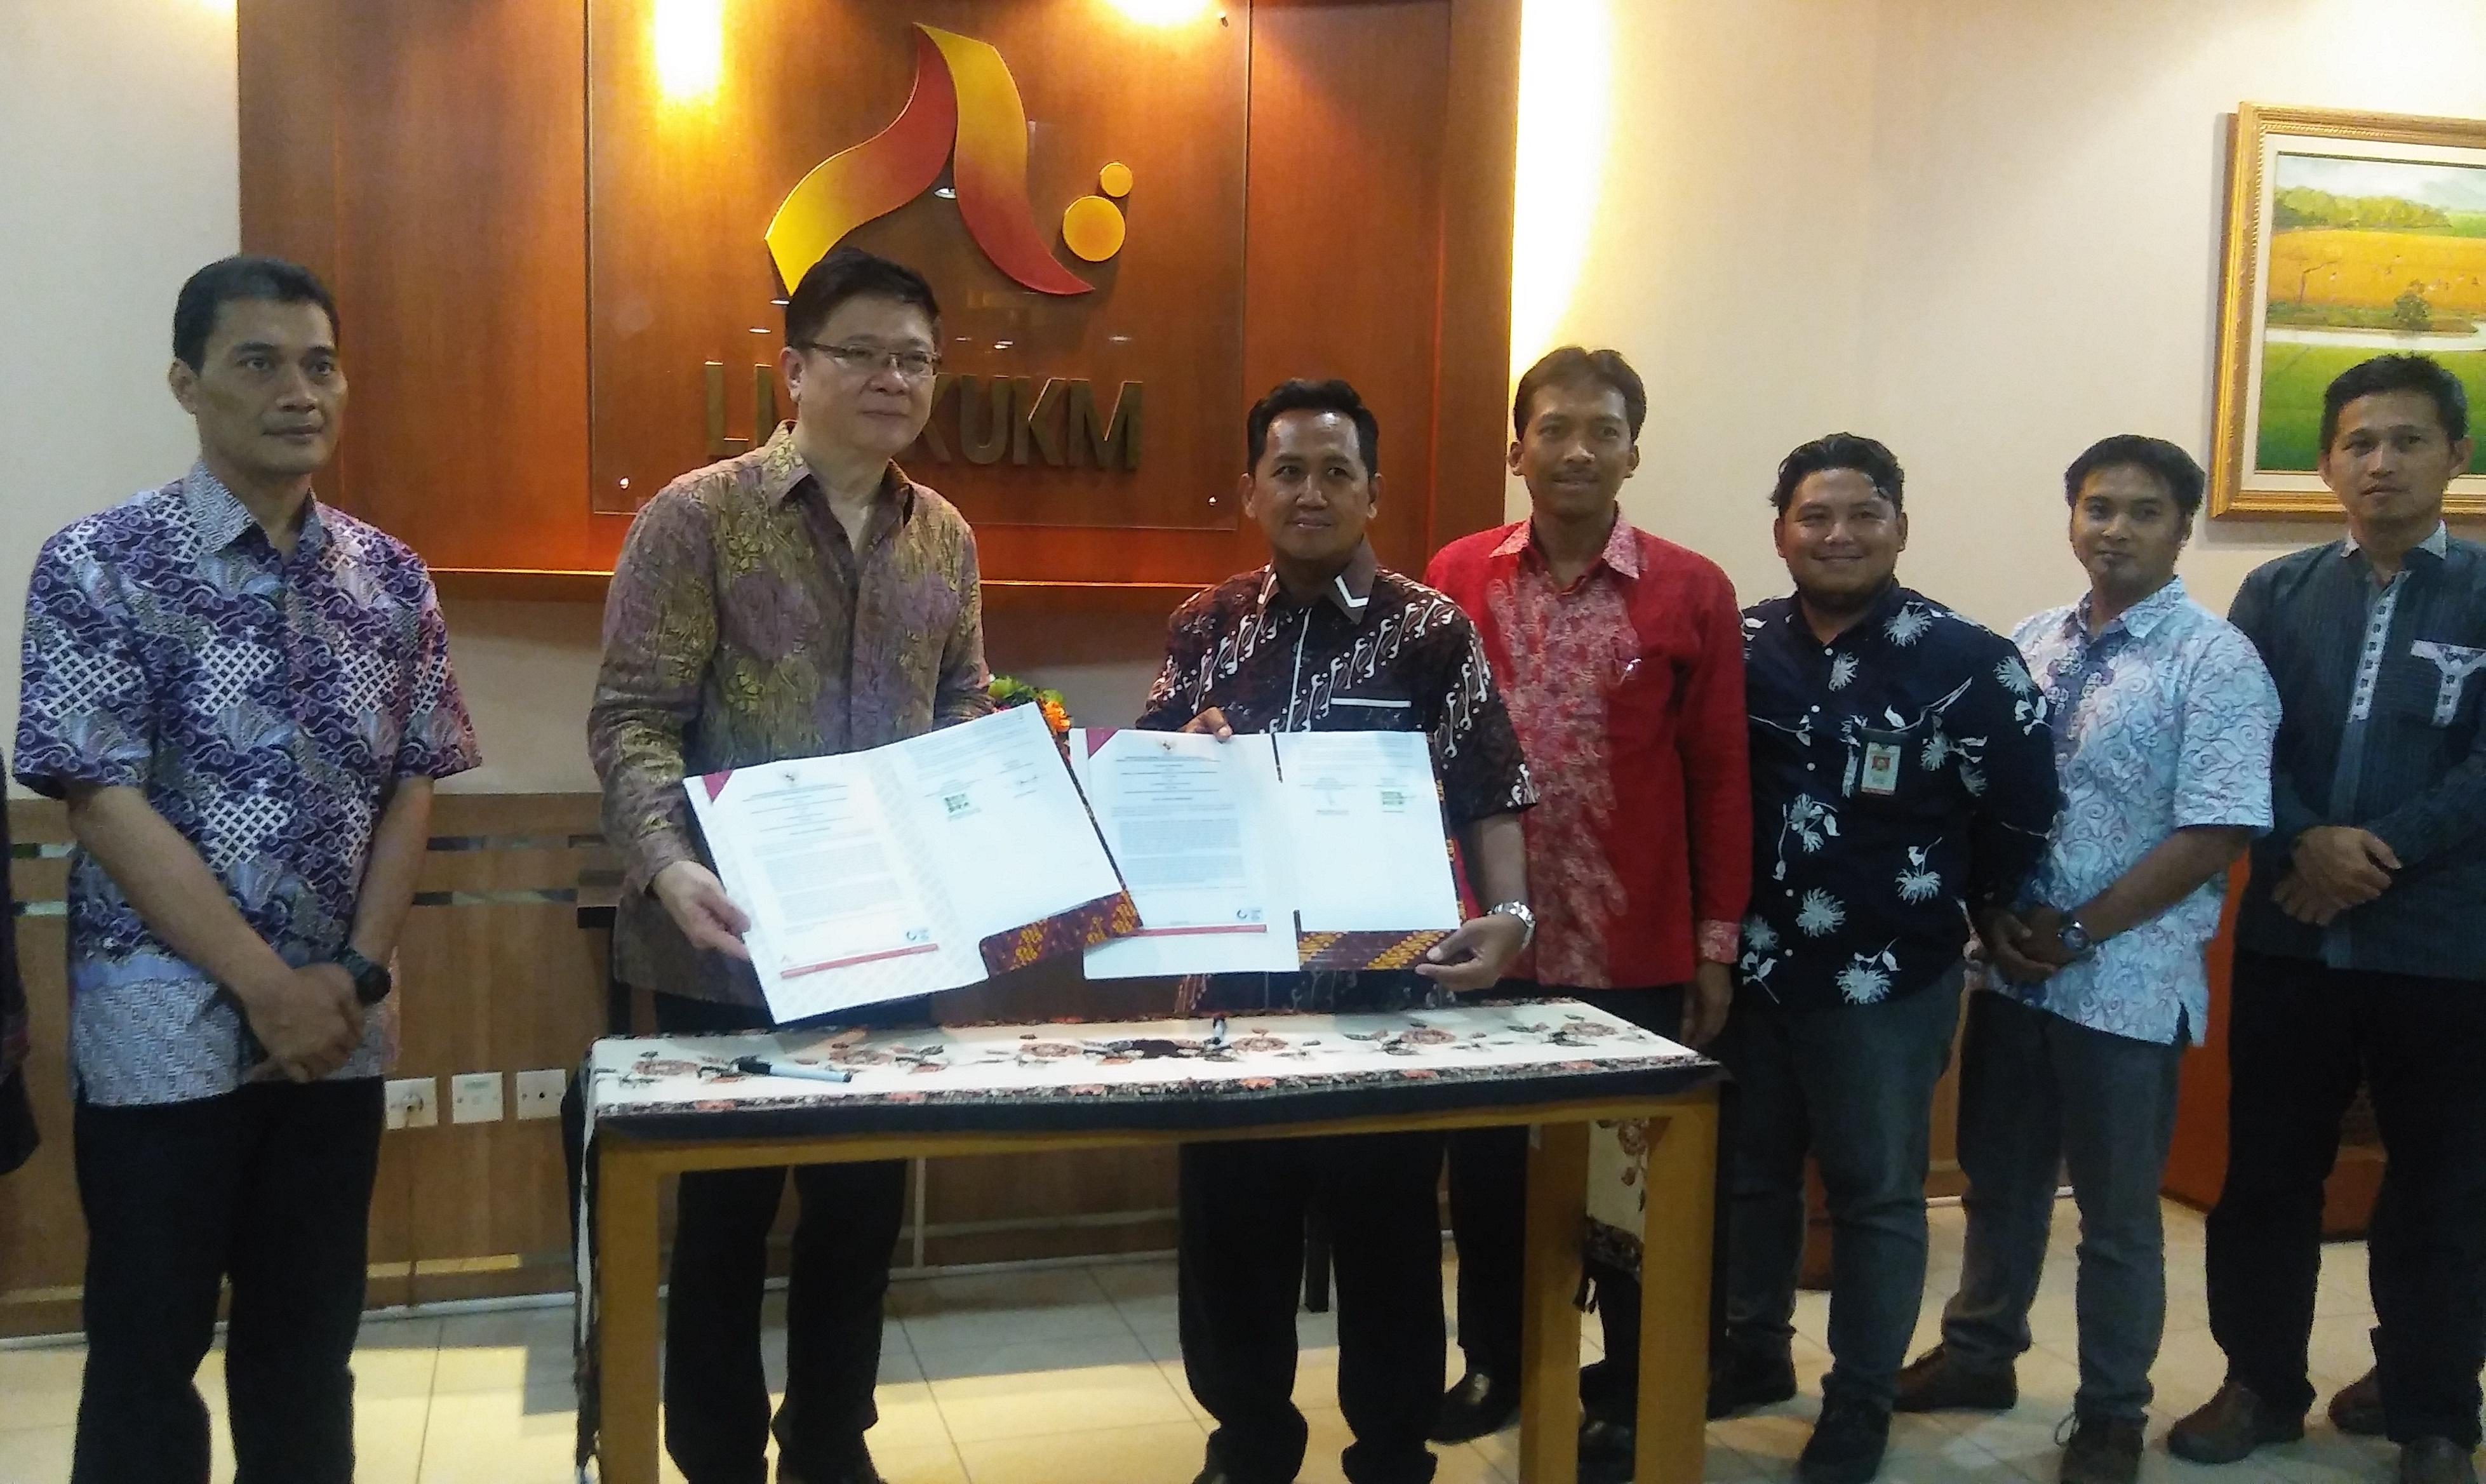 Kolaborasi IPG – SMESCO, Promosikan UKM Indonesia ke Pasar Internasional